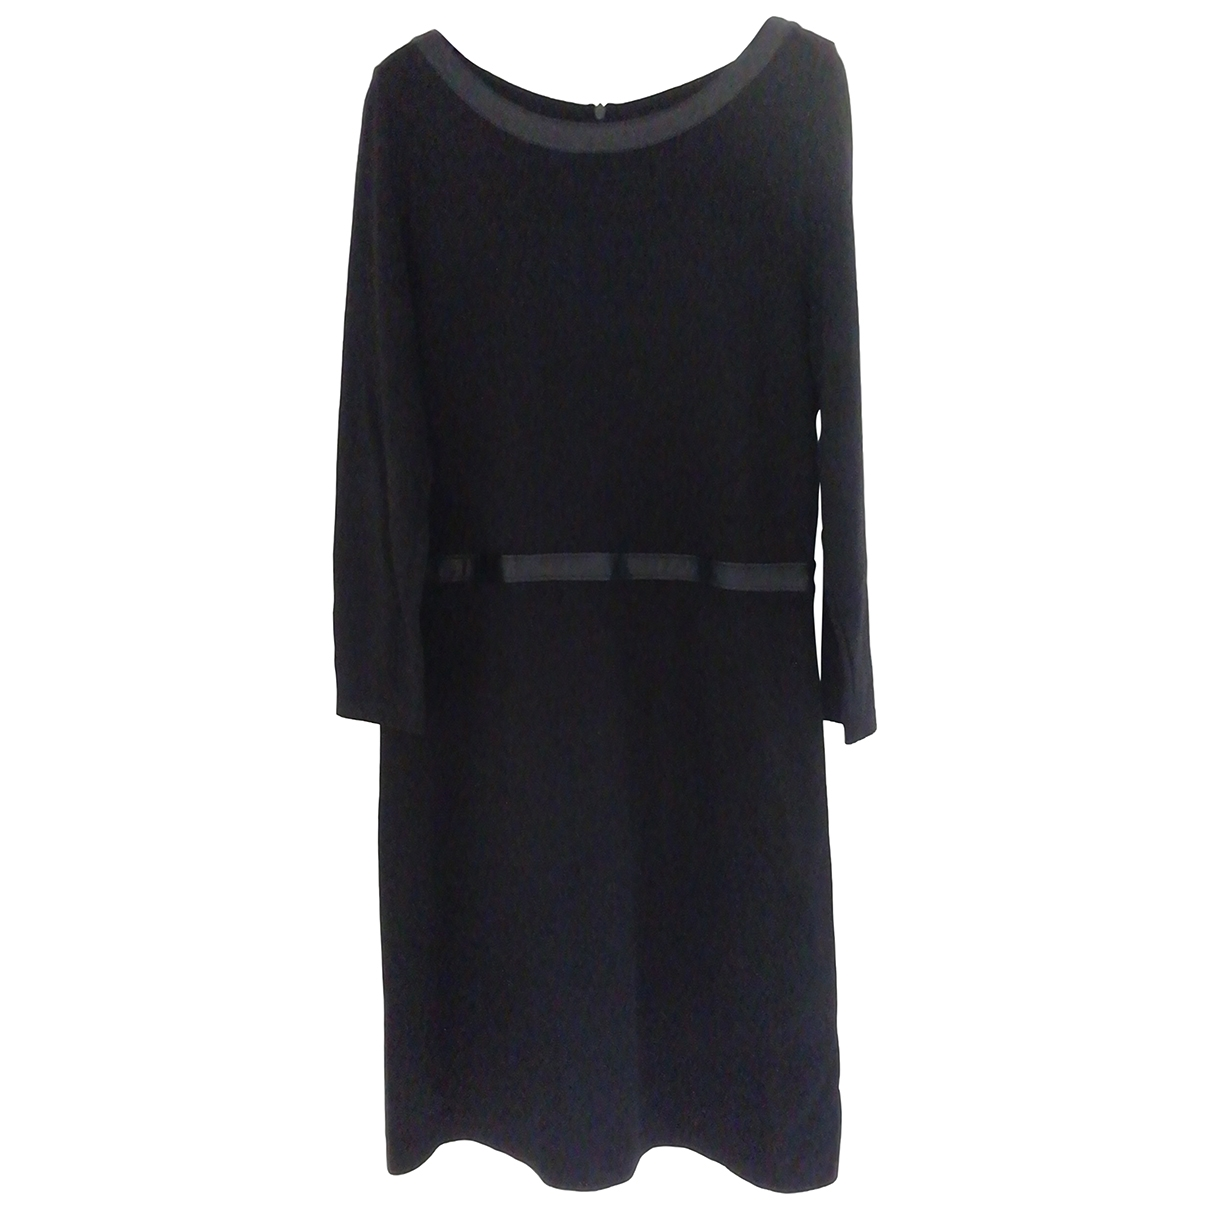 Lauren Ralph Lauren \N Black dress for Women M International